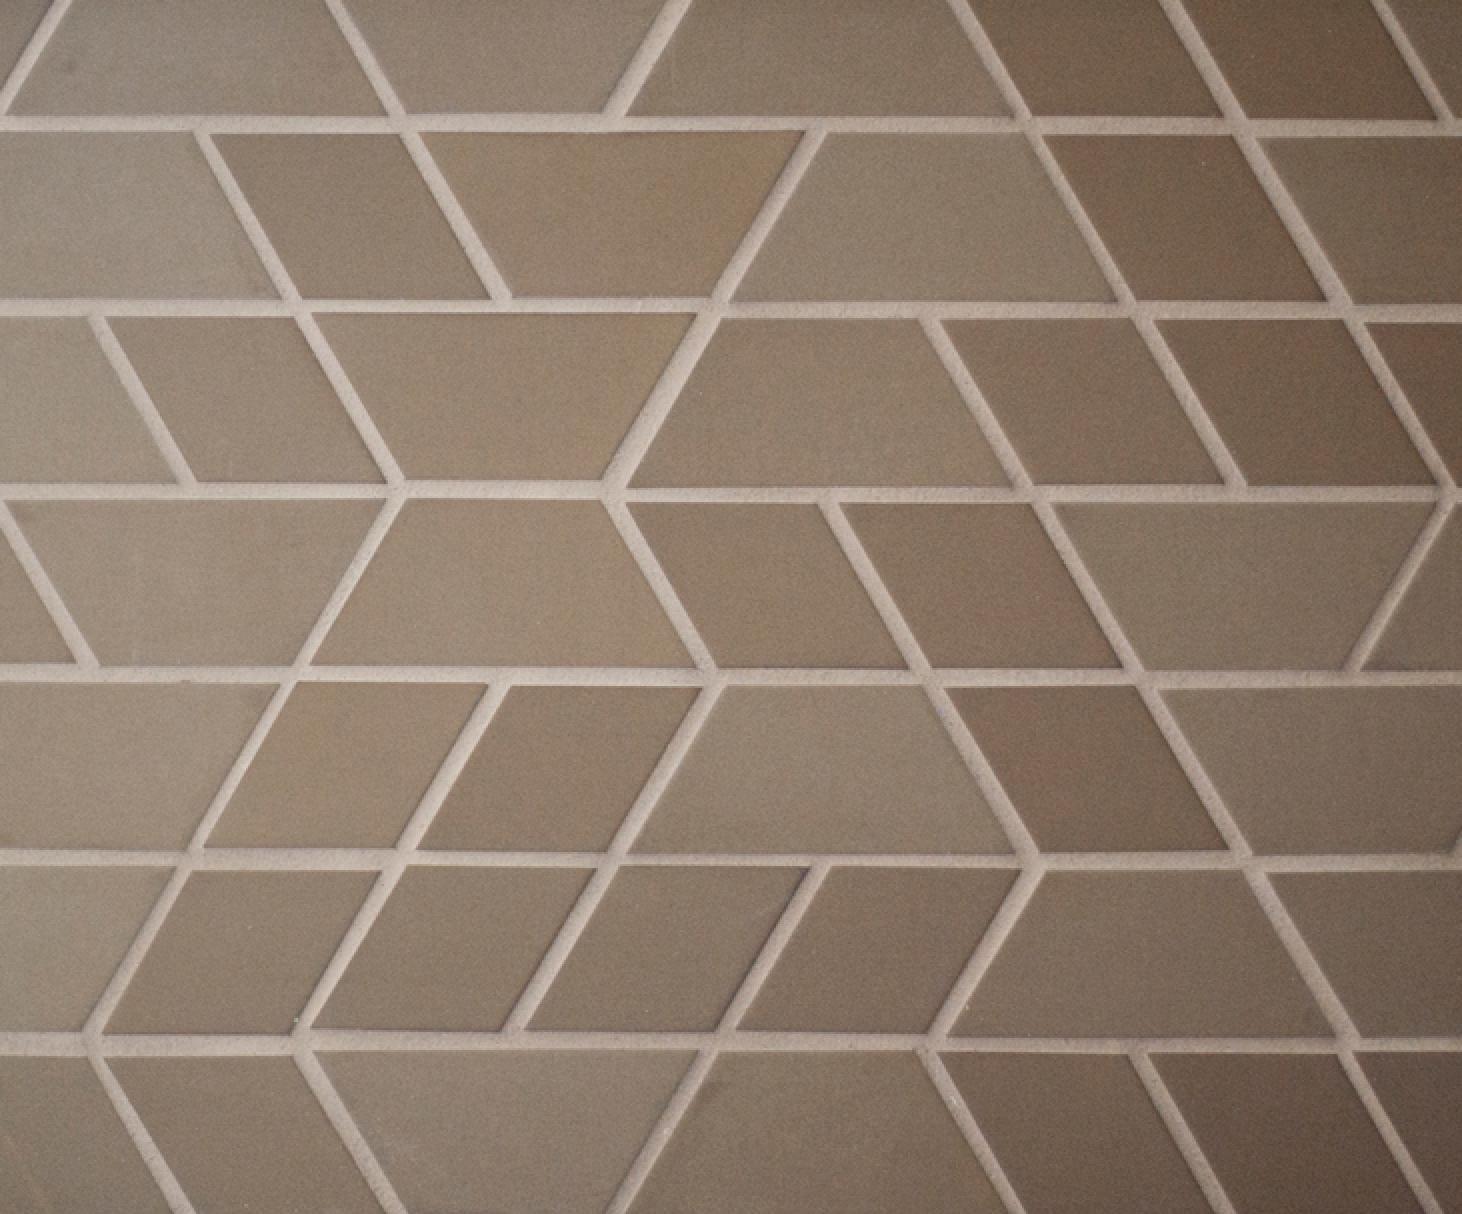 Half Hex Diamond Mix Diamond Tile Heath Ceramics Color Tile Backsplash